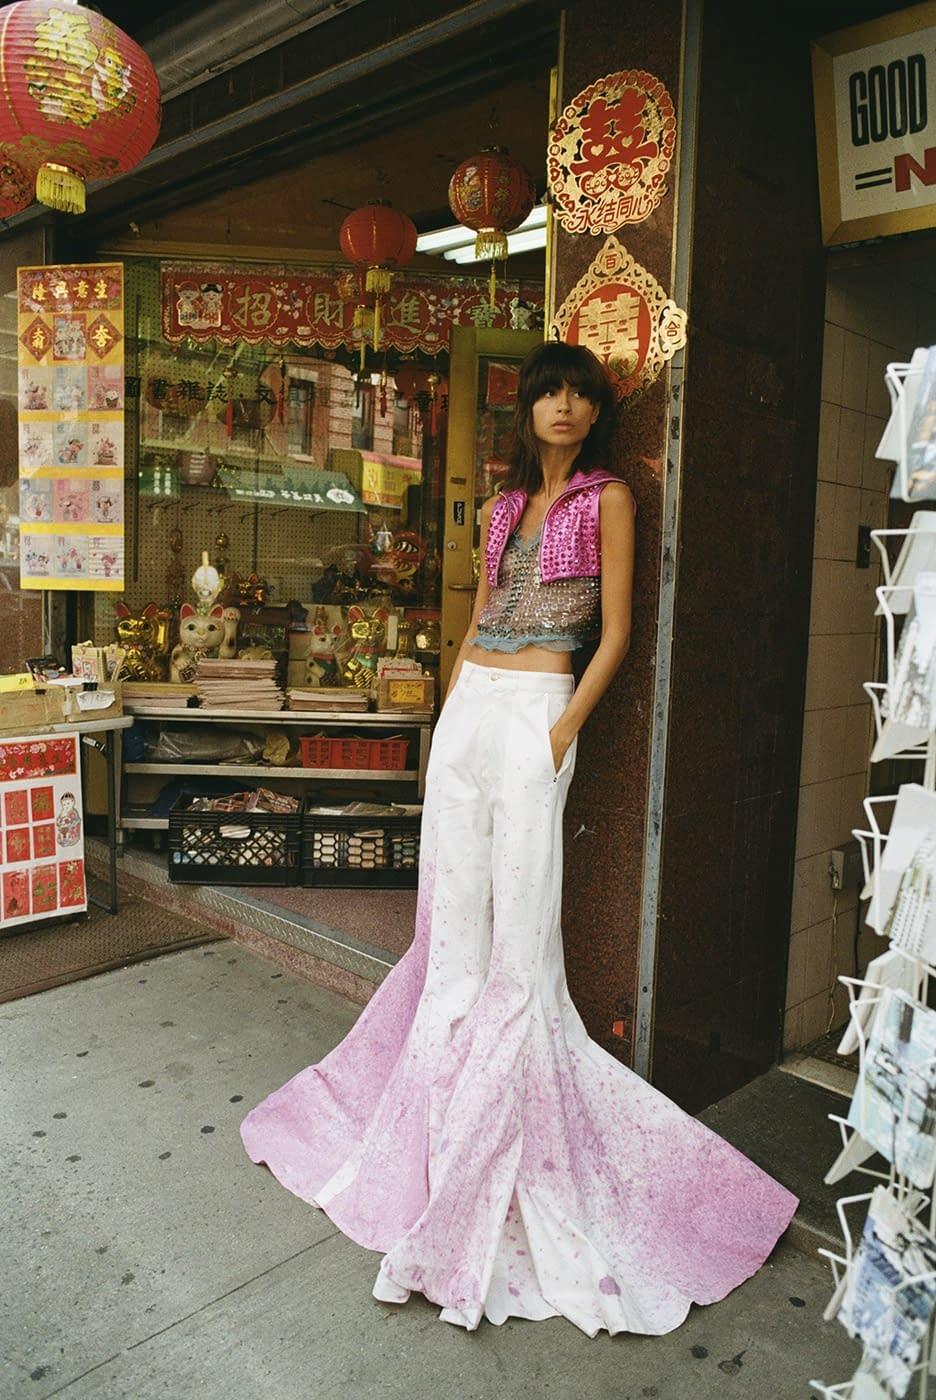 New York Stories 1 photo Enric Galceran - 06